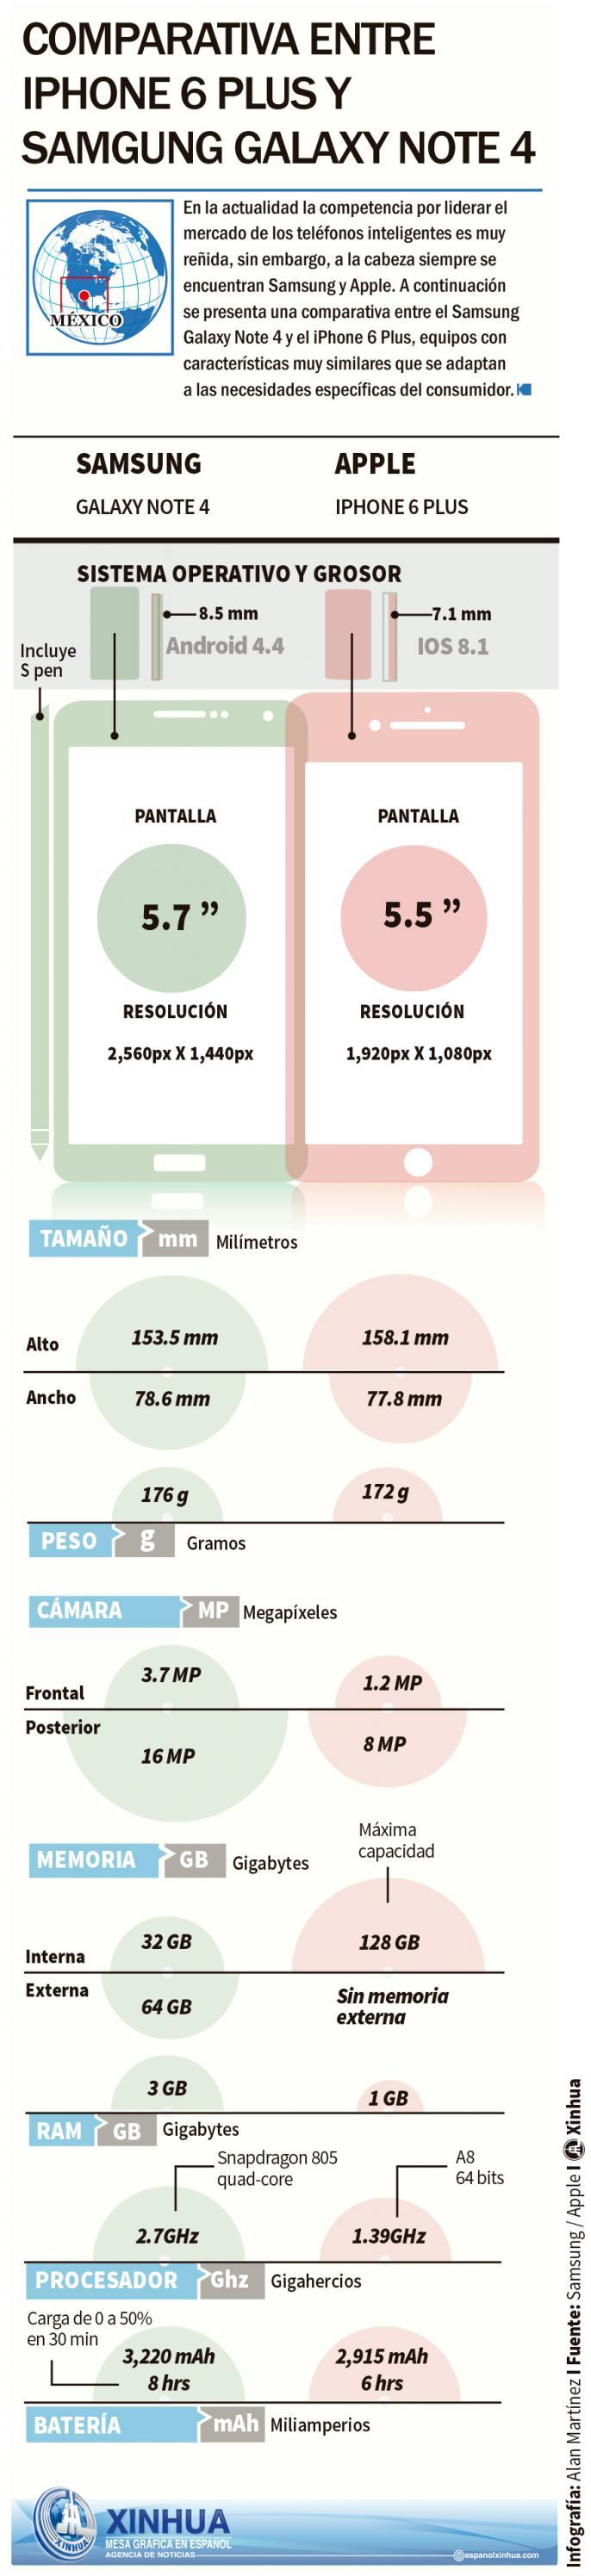 iPhone 6 Plus vs. Samsung Galaxy Note 4